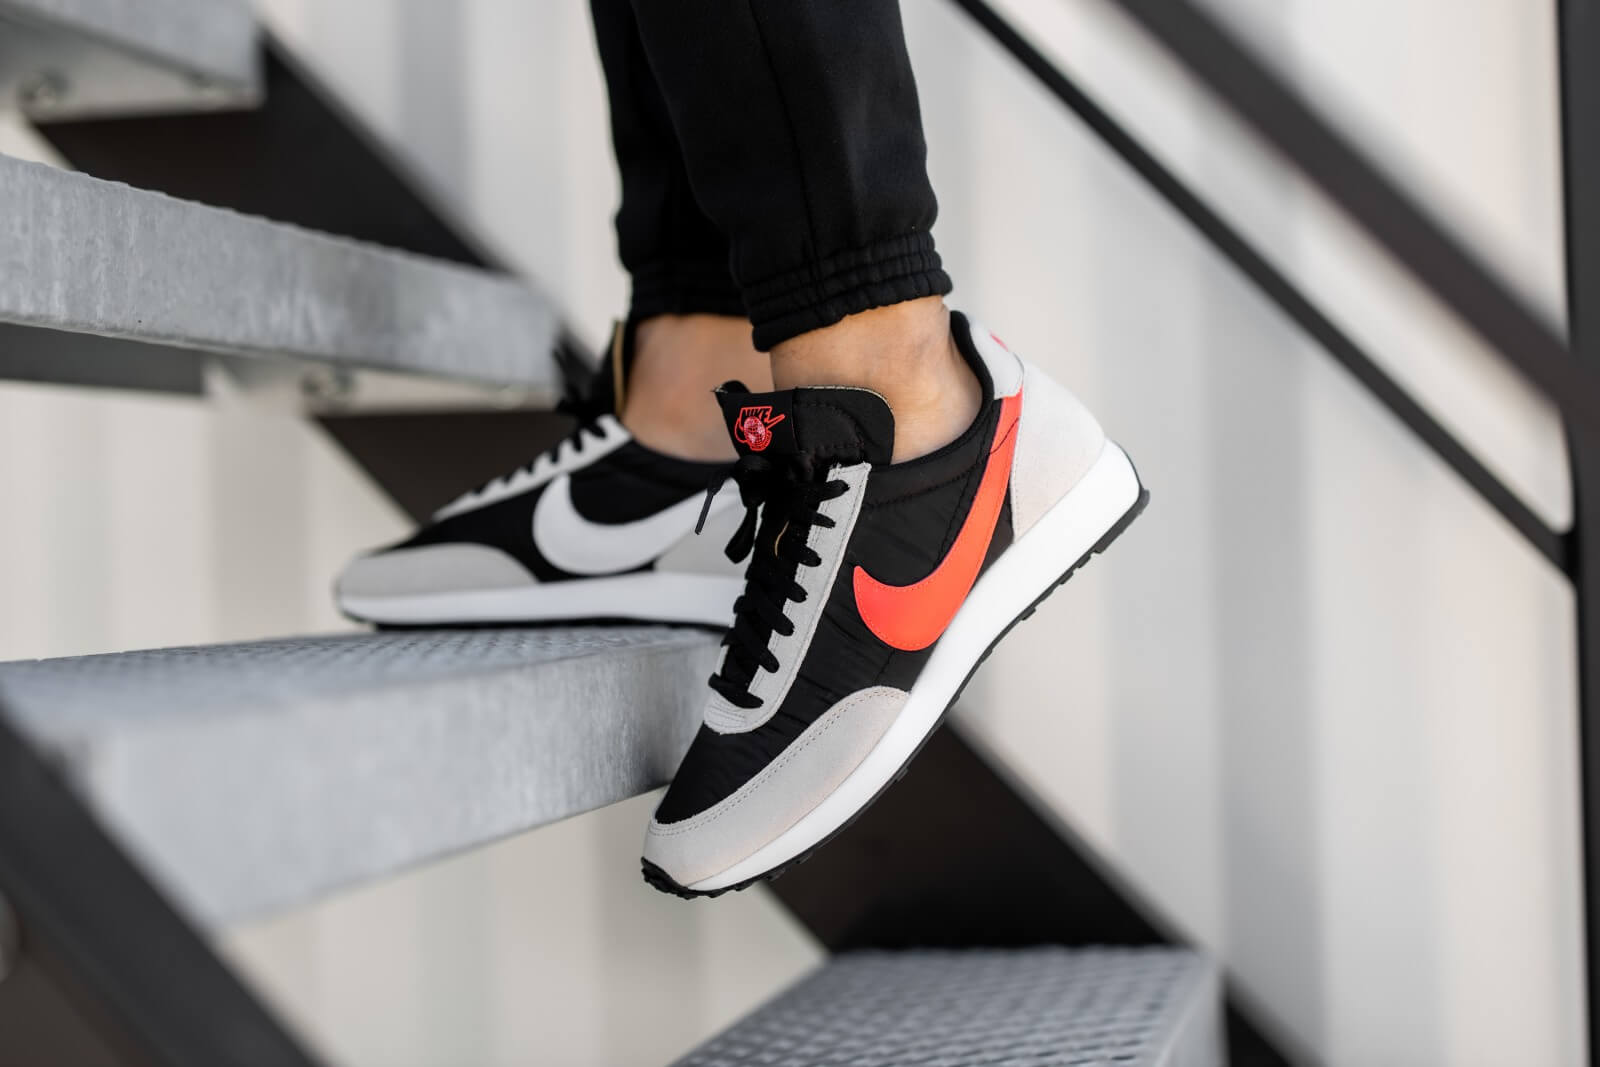 Nike Air Tailwind 79 SE Worldwide Pack Black/Flash Crimson-Light Bone